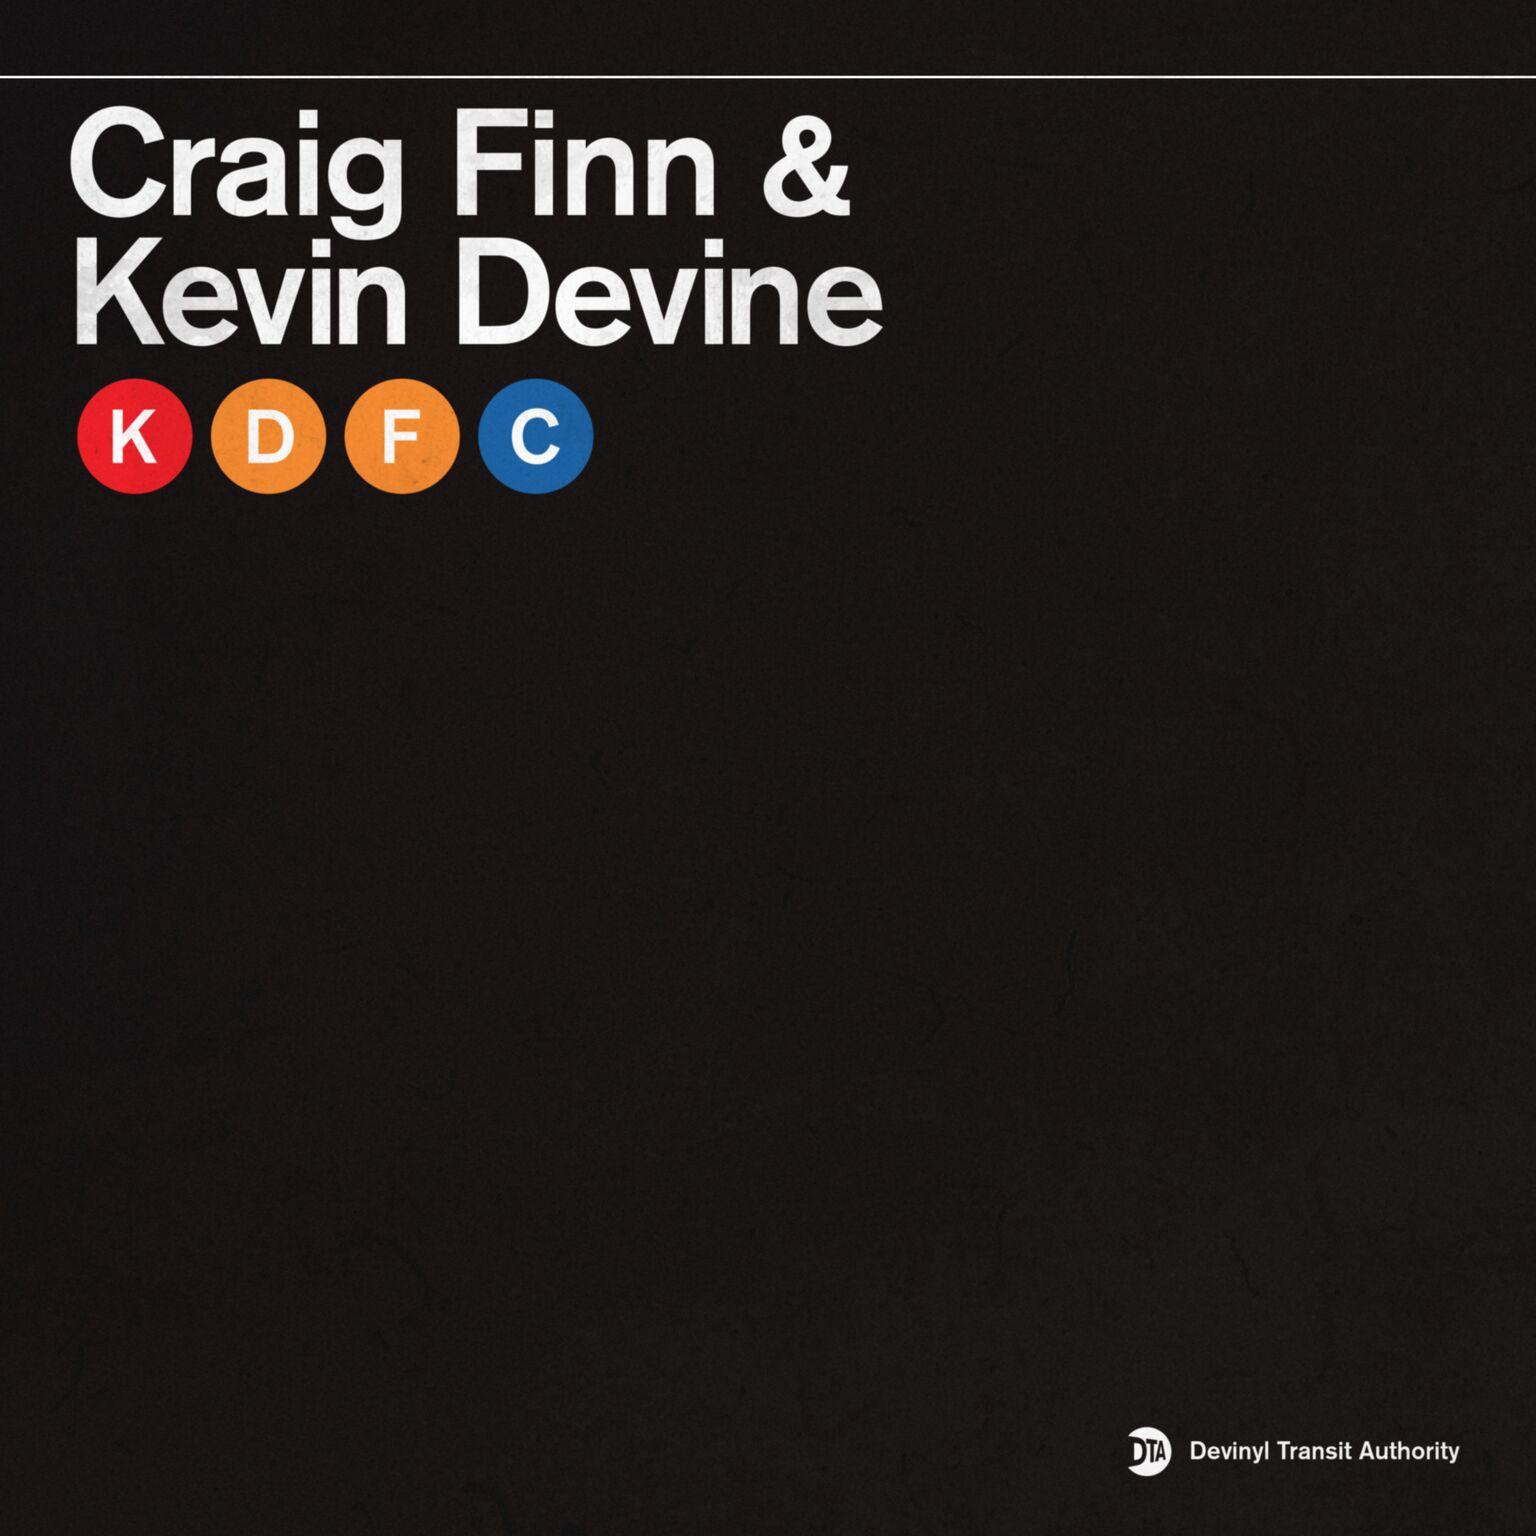 Craig Finn & Kevin Devine - split 7